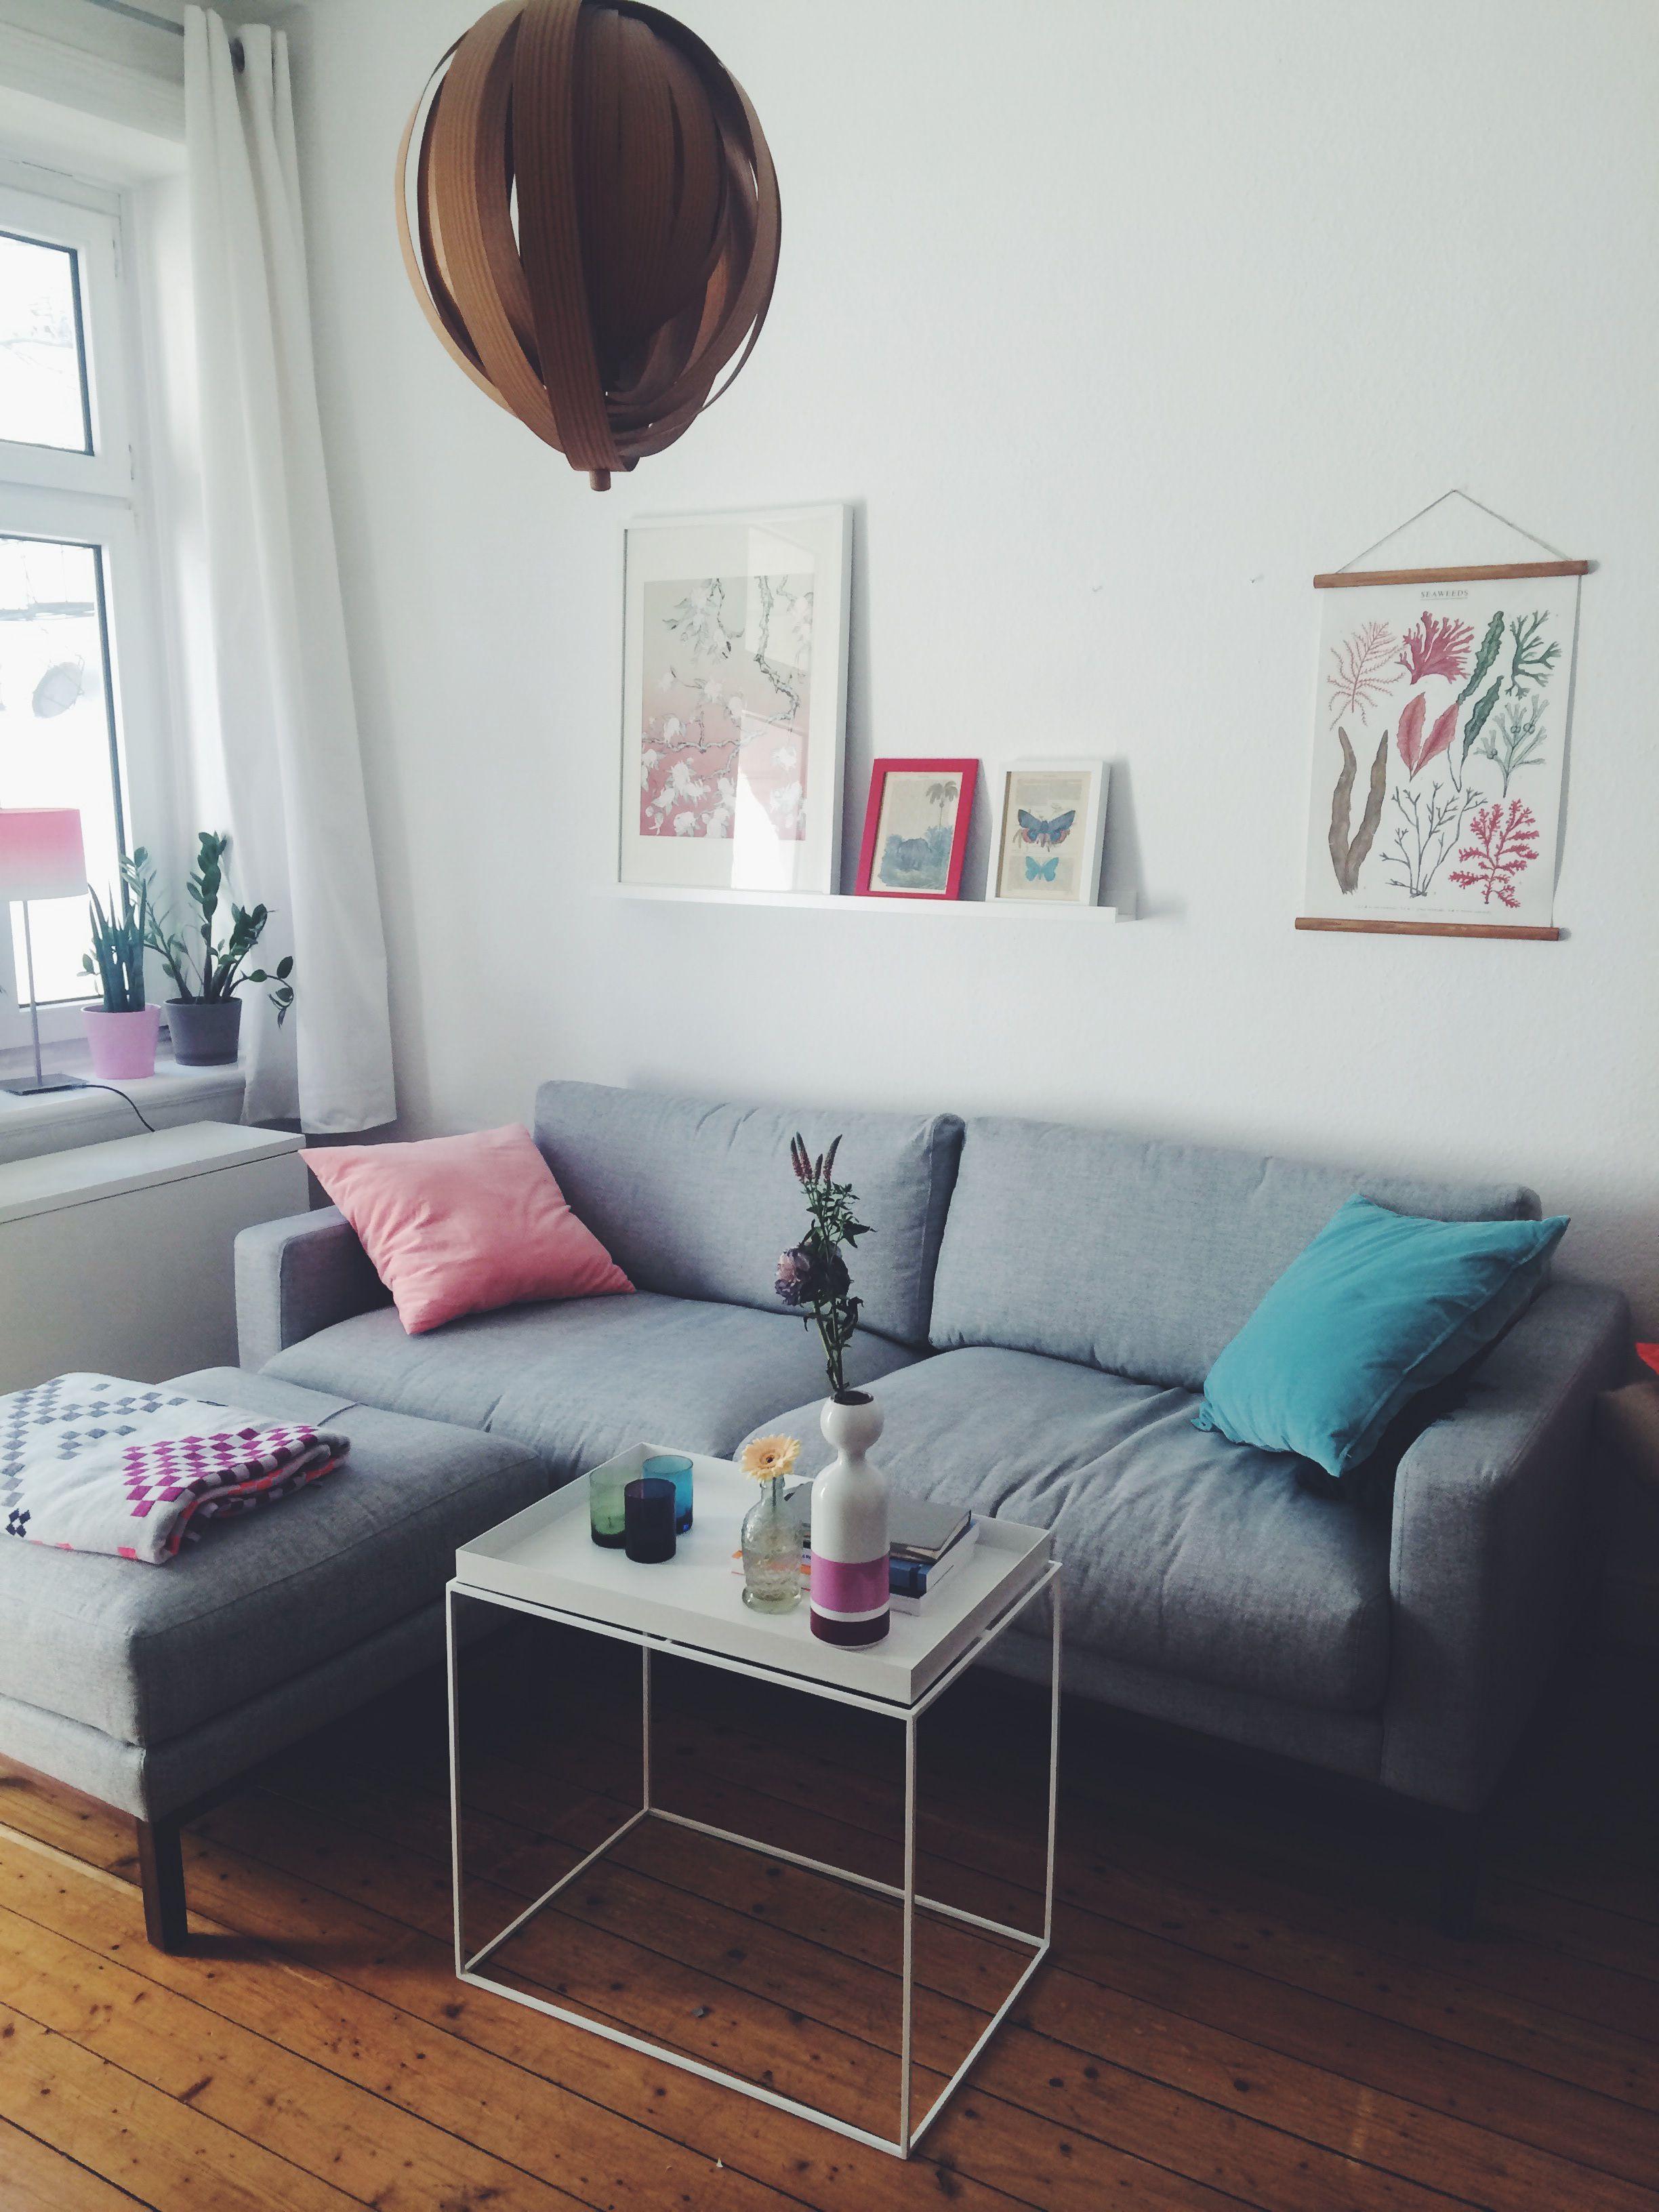 Bolia North Sofa, Hay Tray Table | Heima | Pinterest | Wohnzimmer ...